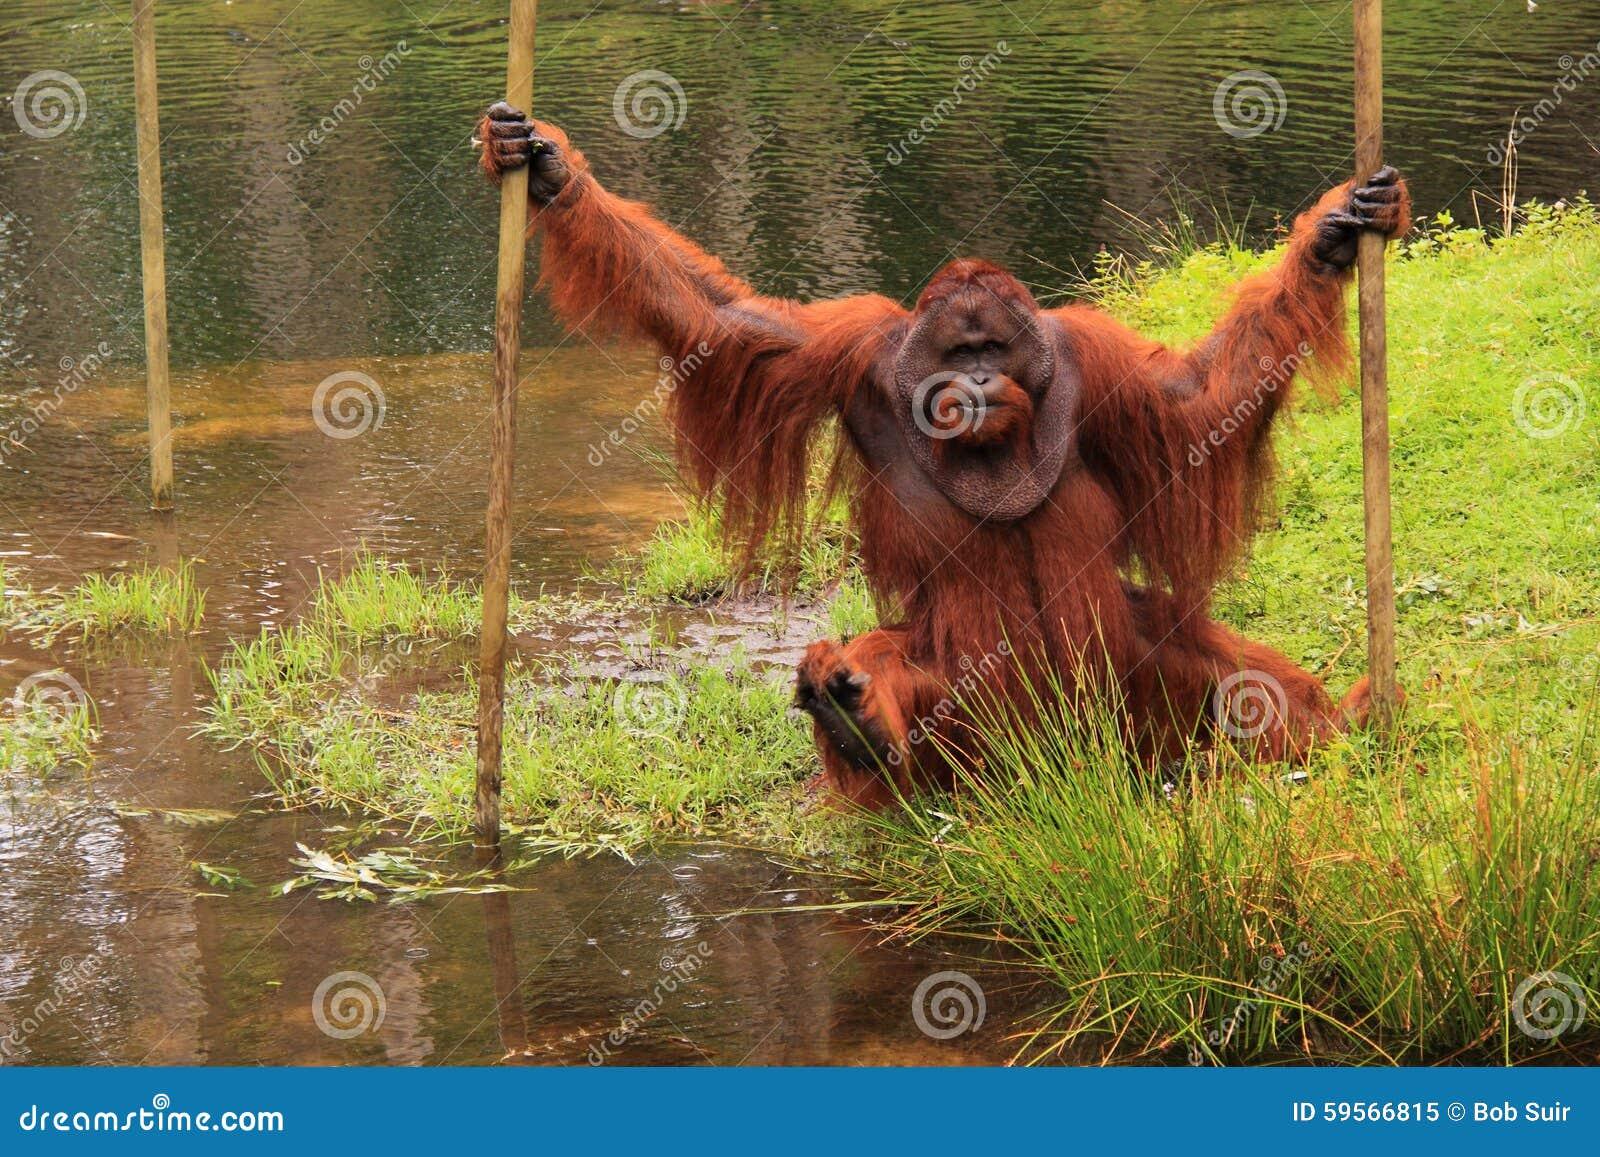 Orang outan crossing water pool